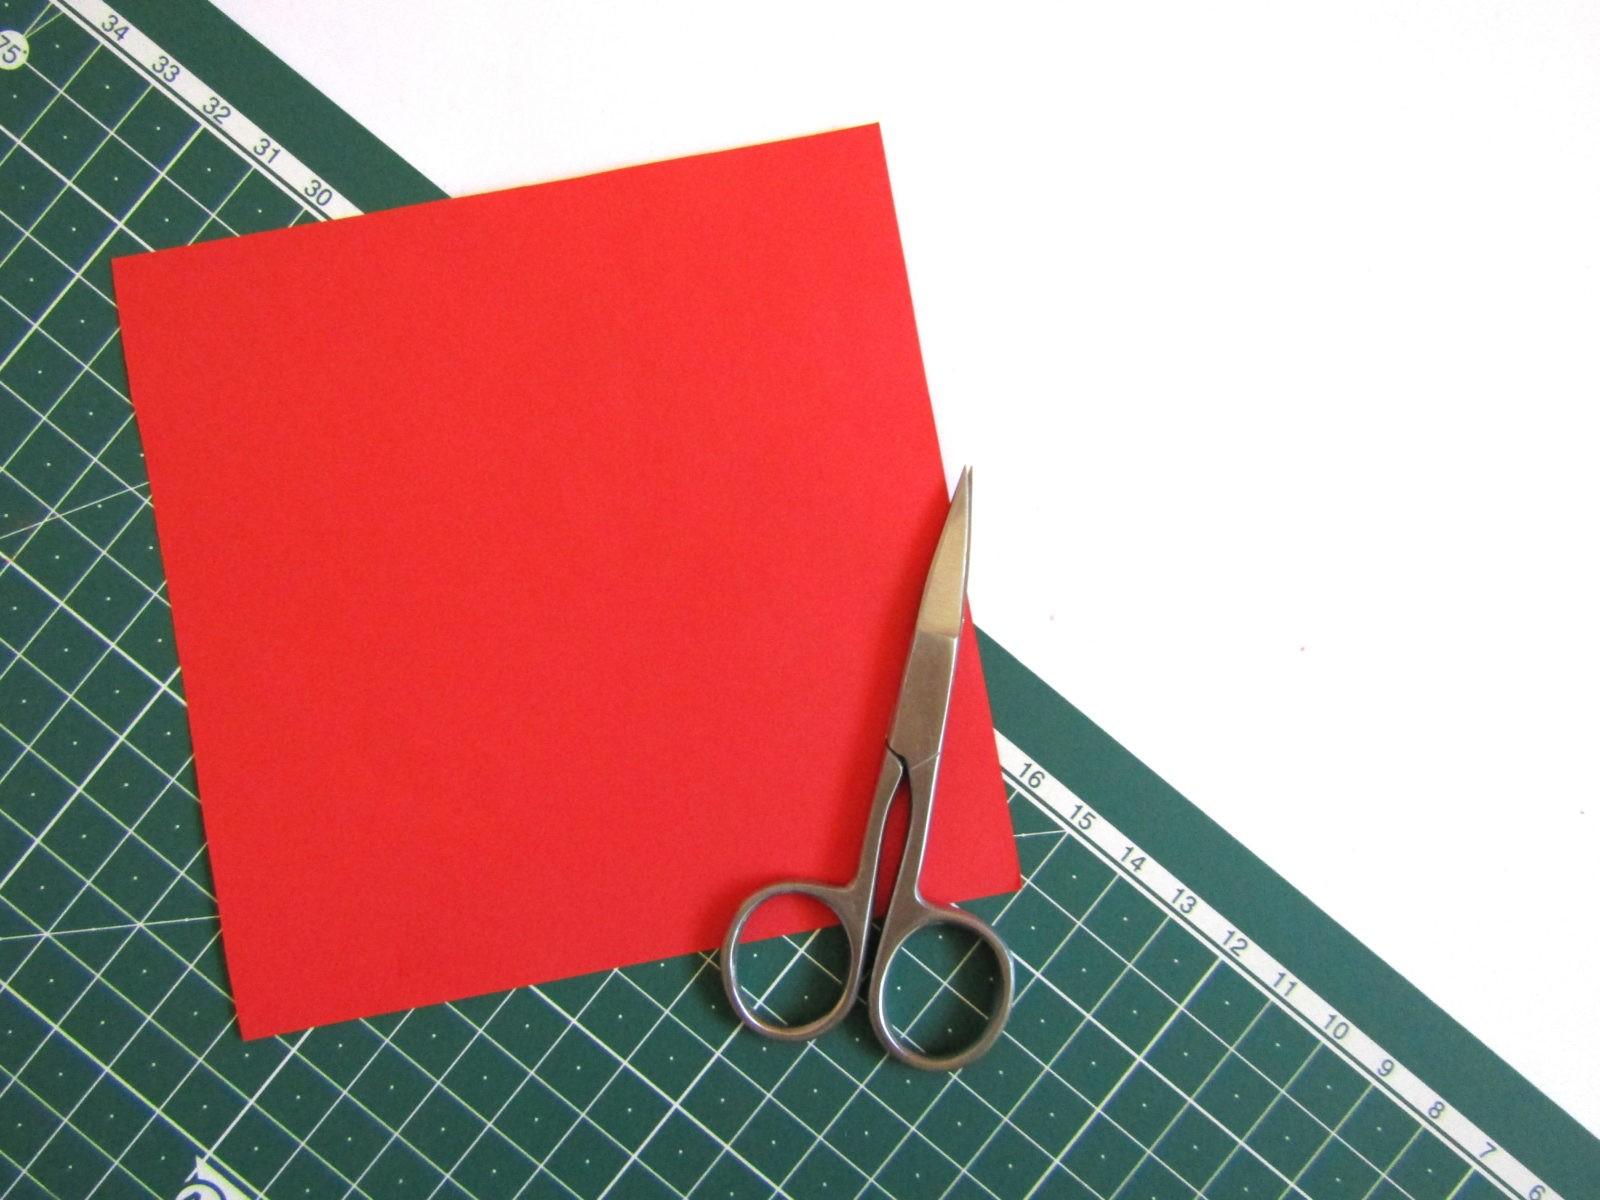 Оригами тюльпан из бумаги -2